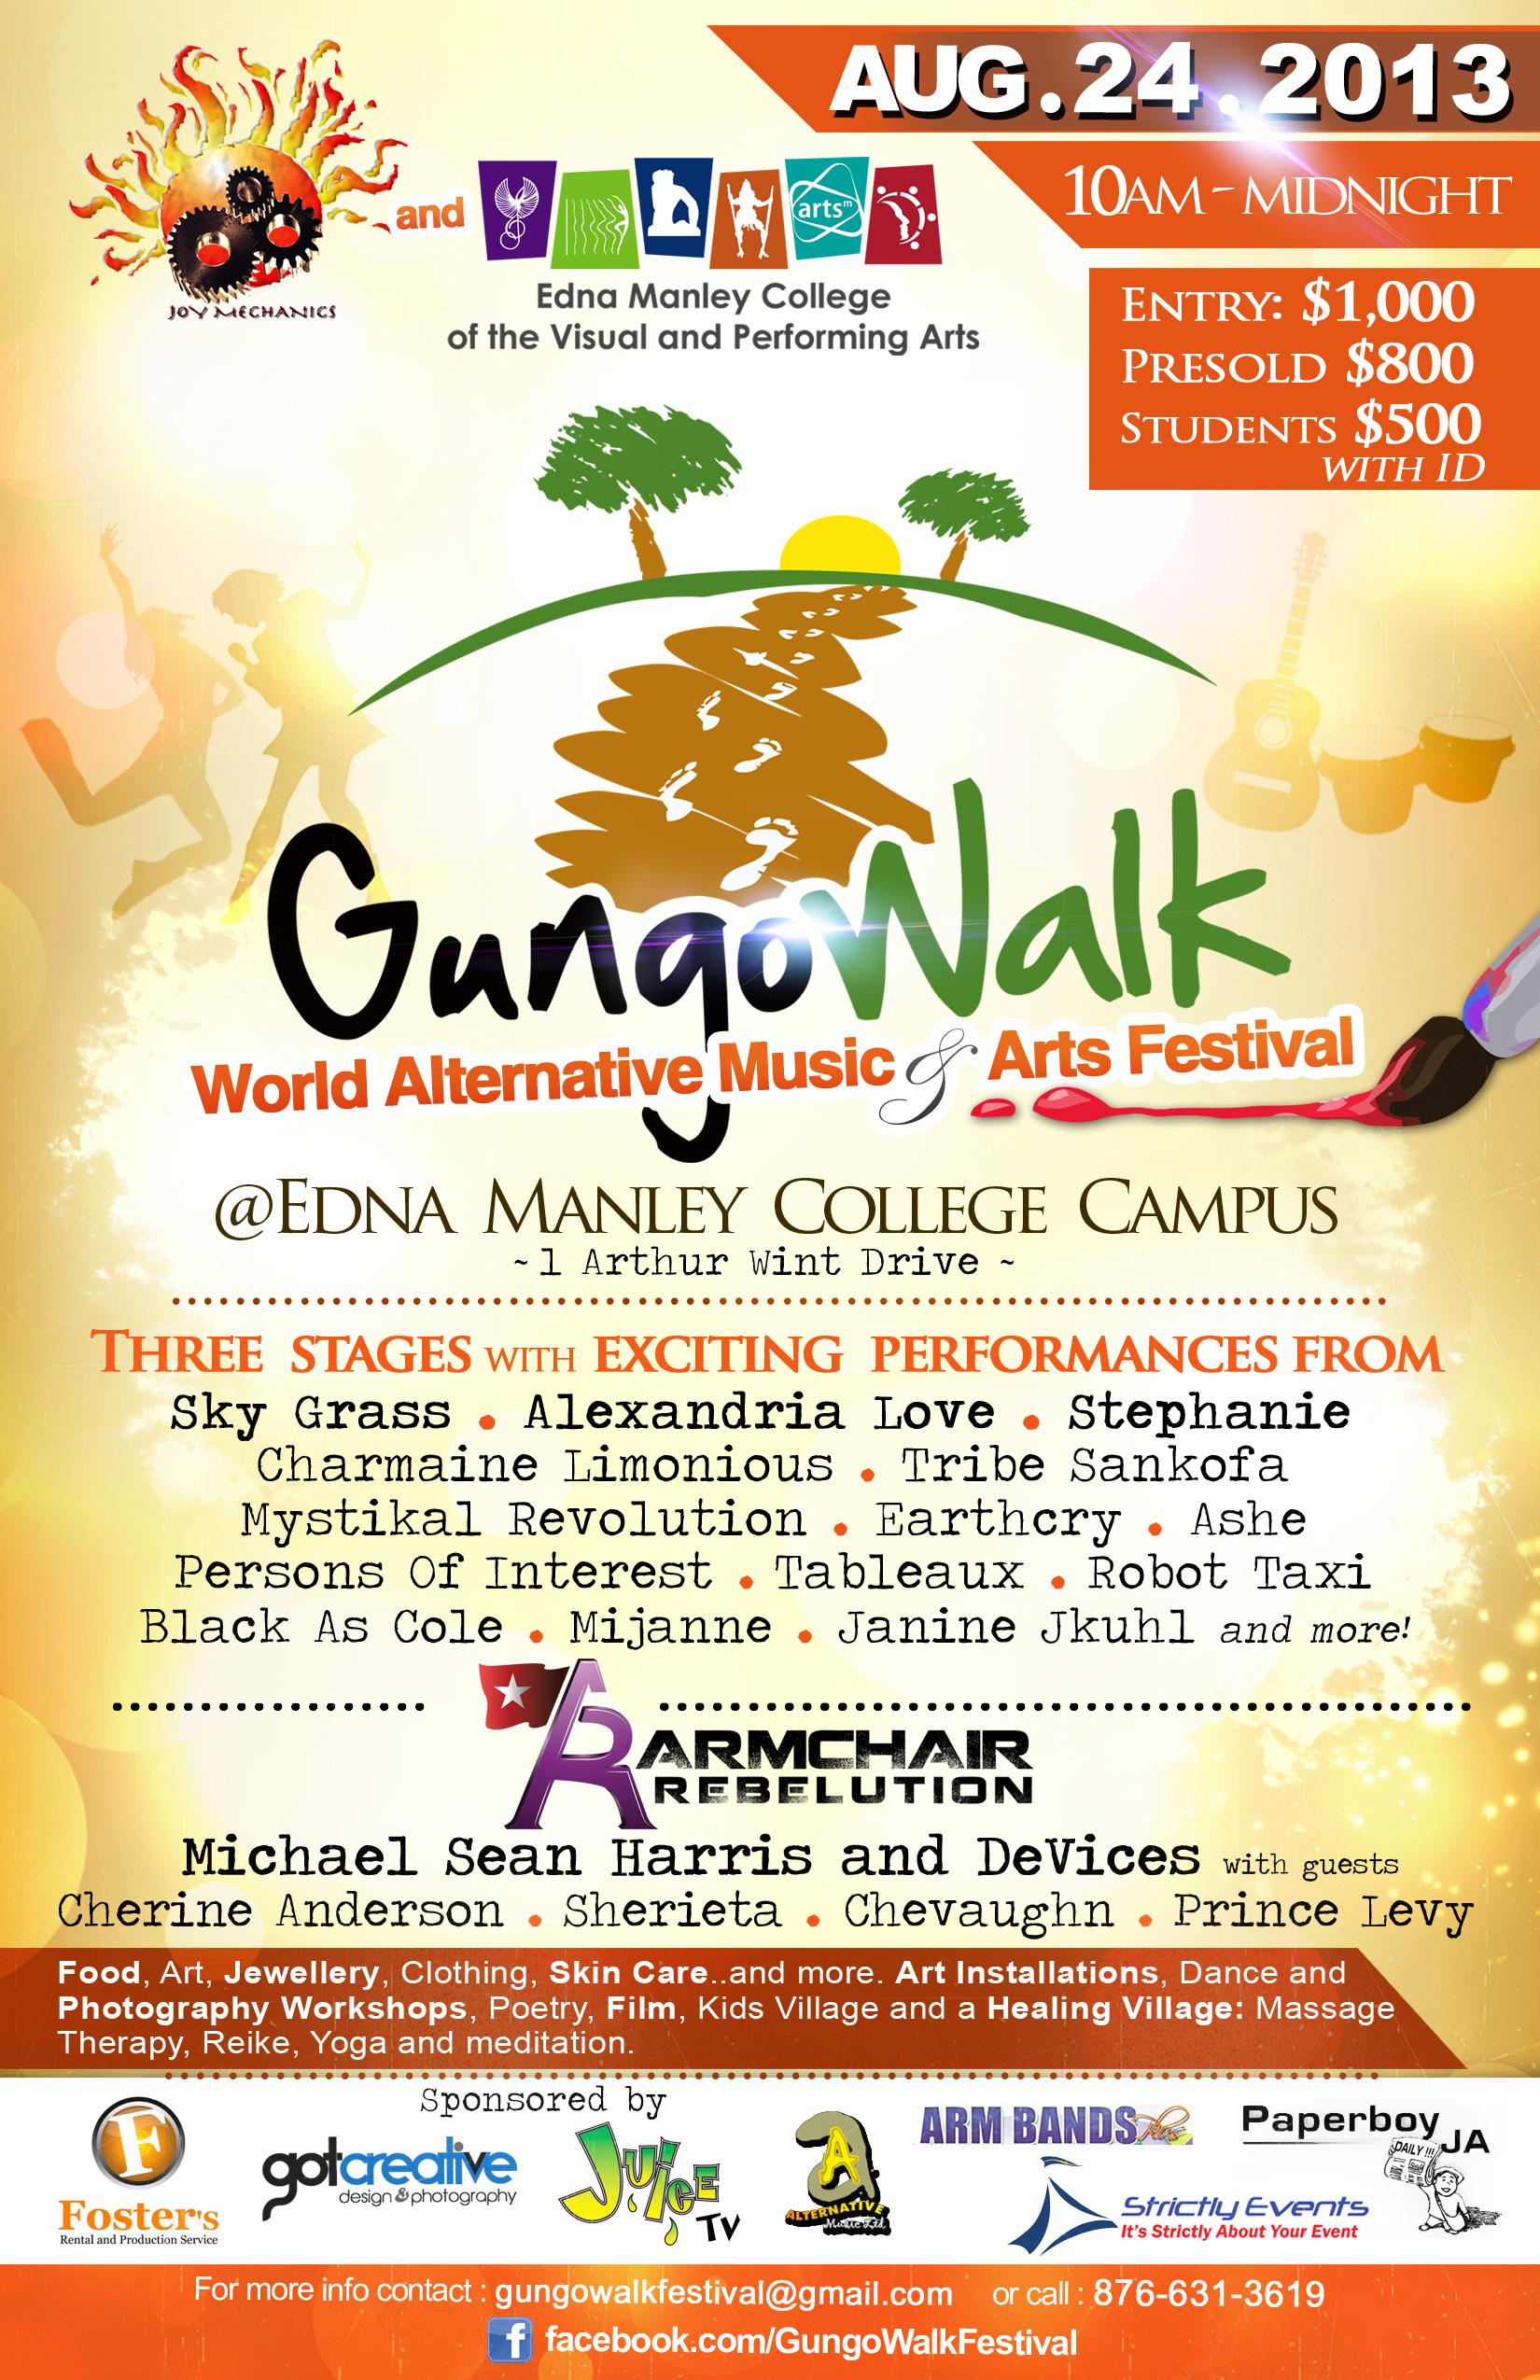 GUNGo Walk Flyer 1_one side1